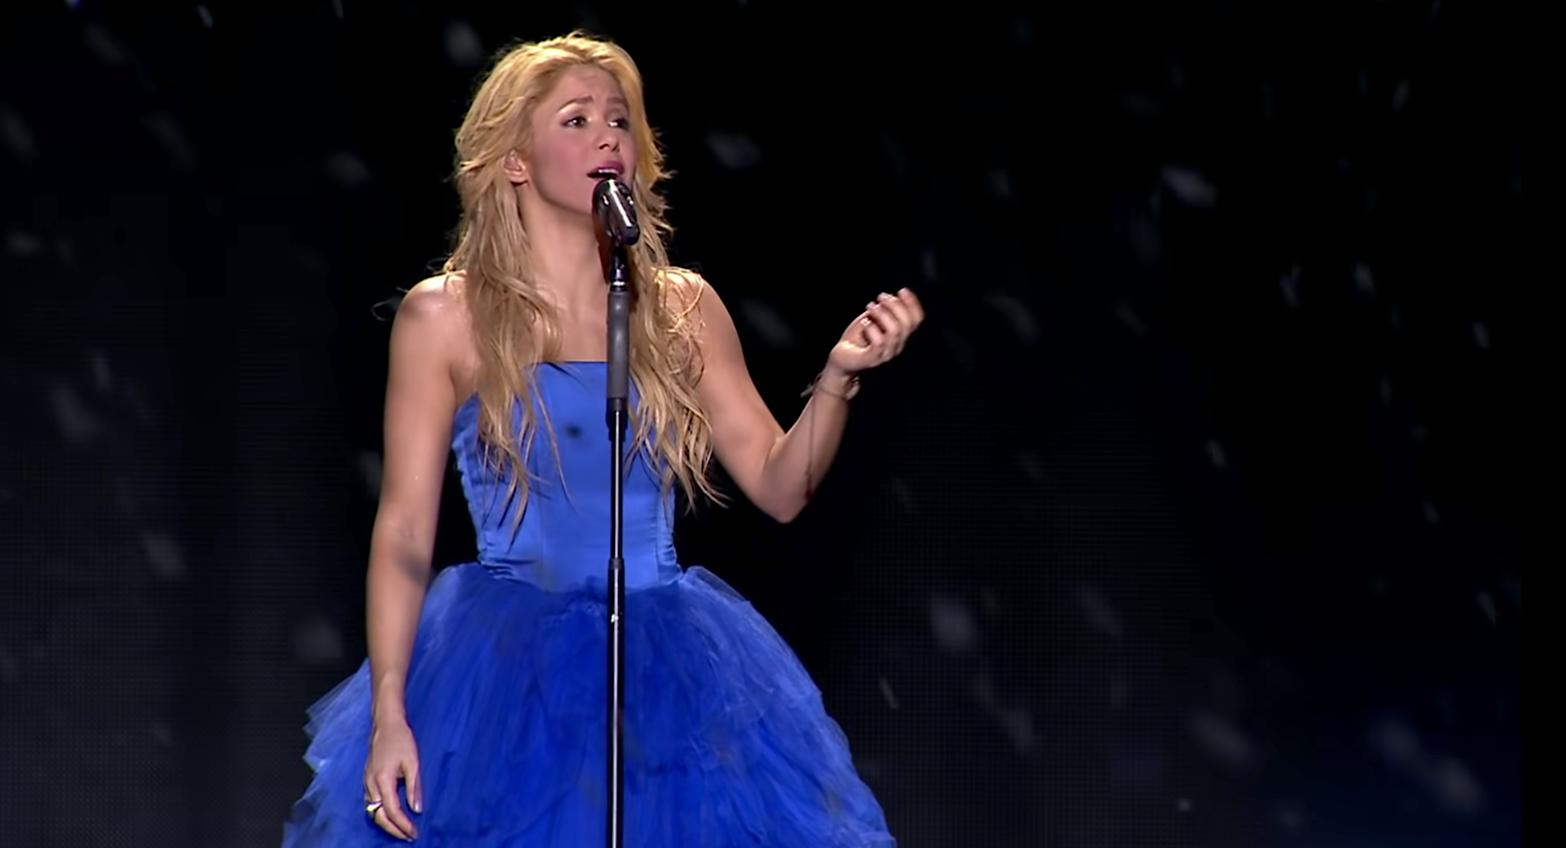 H Shakira εξομολογείται   Oι απογοητευτικές εμφανίσεις που θέλει να ξεχάσει